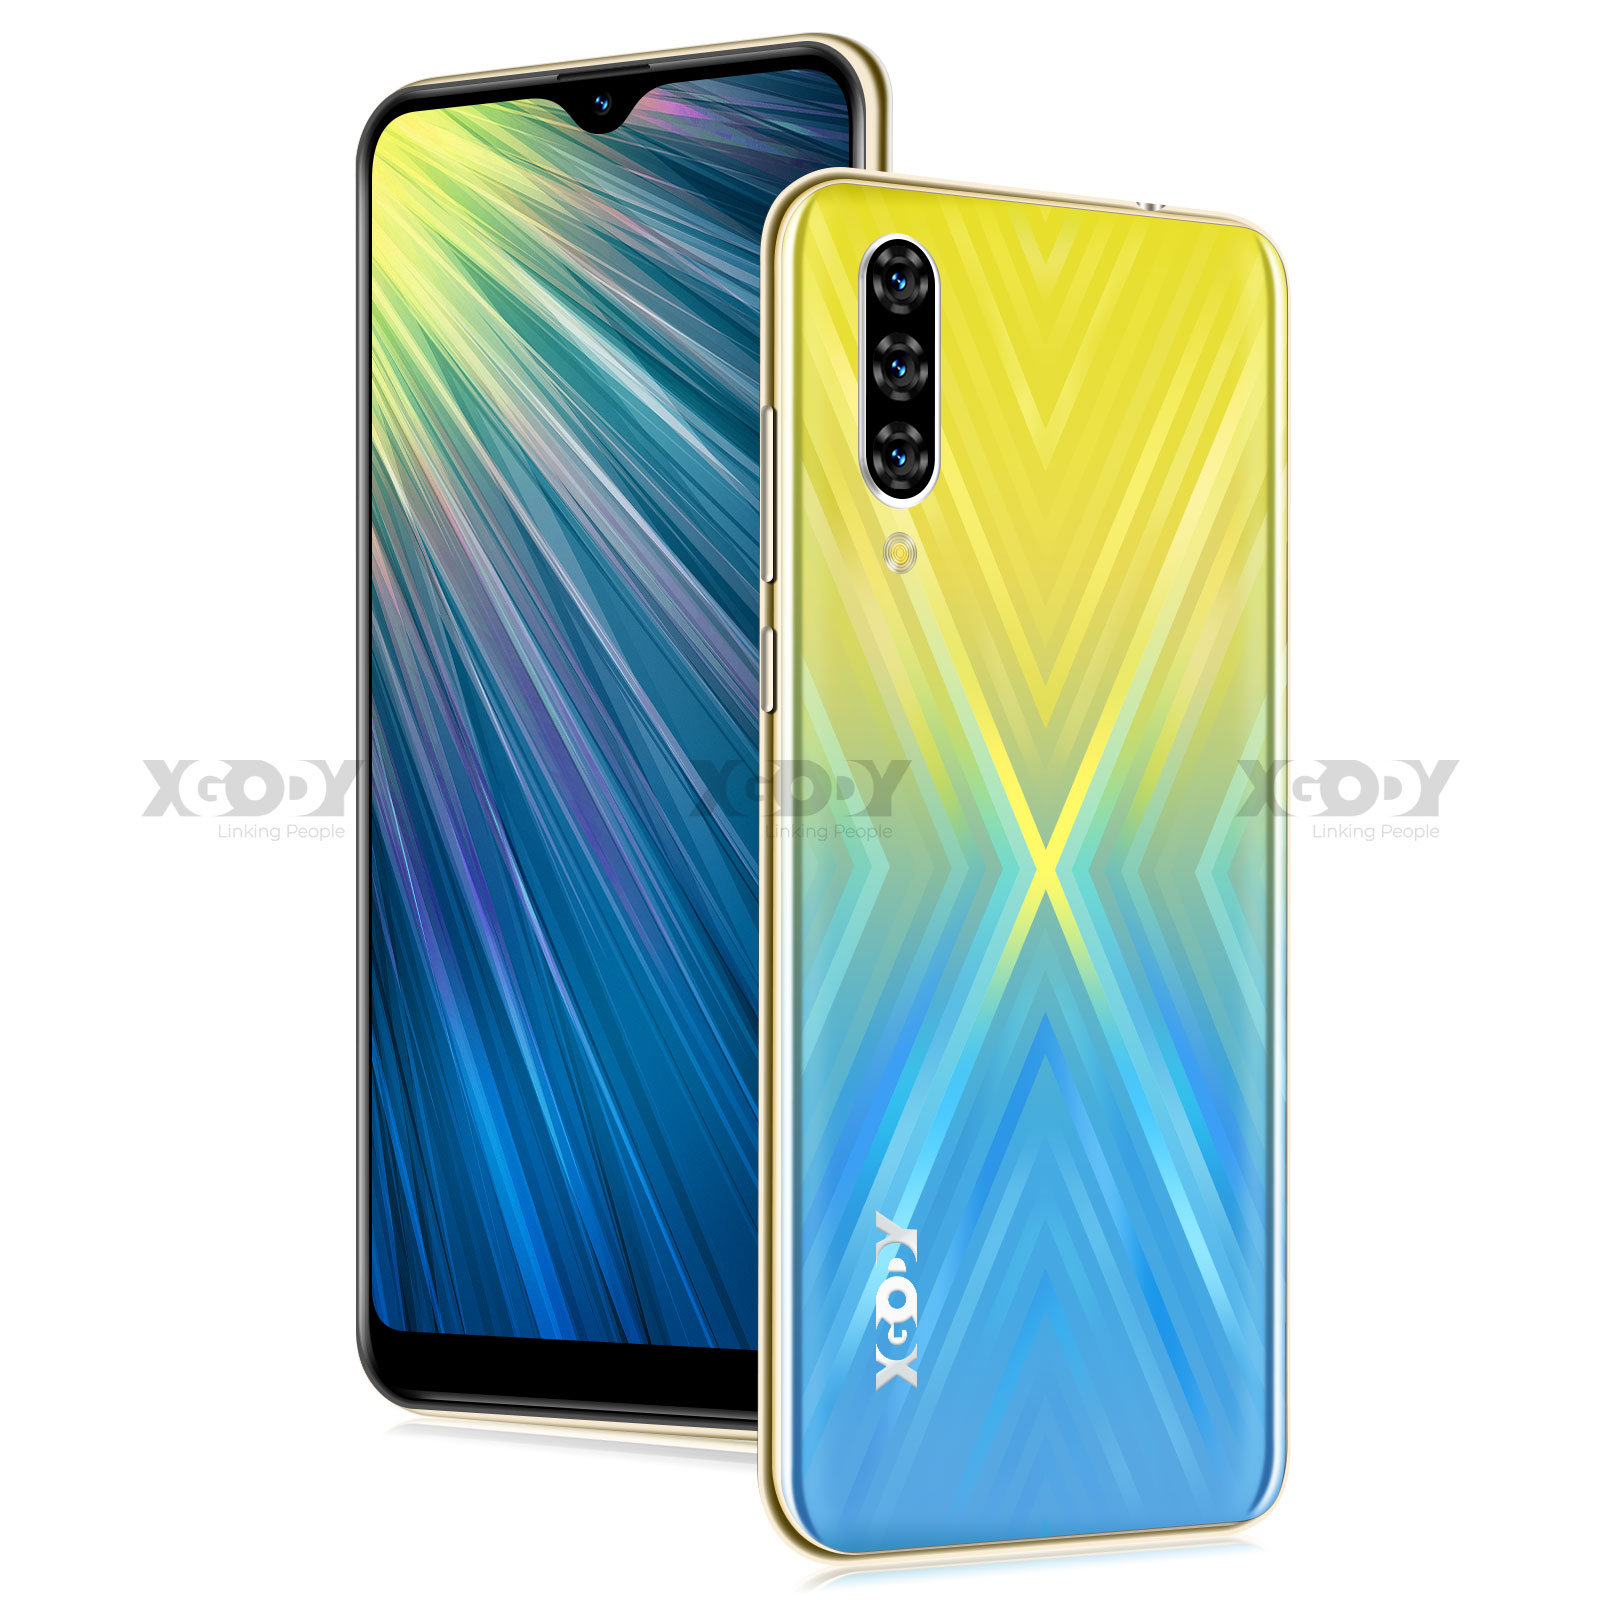 XGODY Note 7 Smartphone Dual Sim Celular 6.26'' Waterdrop Screen Android 9.0 2GB 16GB Quad Core 2800mAh Face ID 3G Mobile Phone